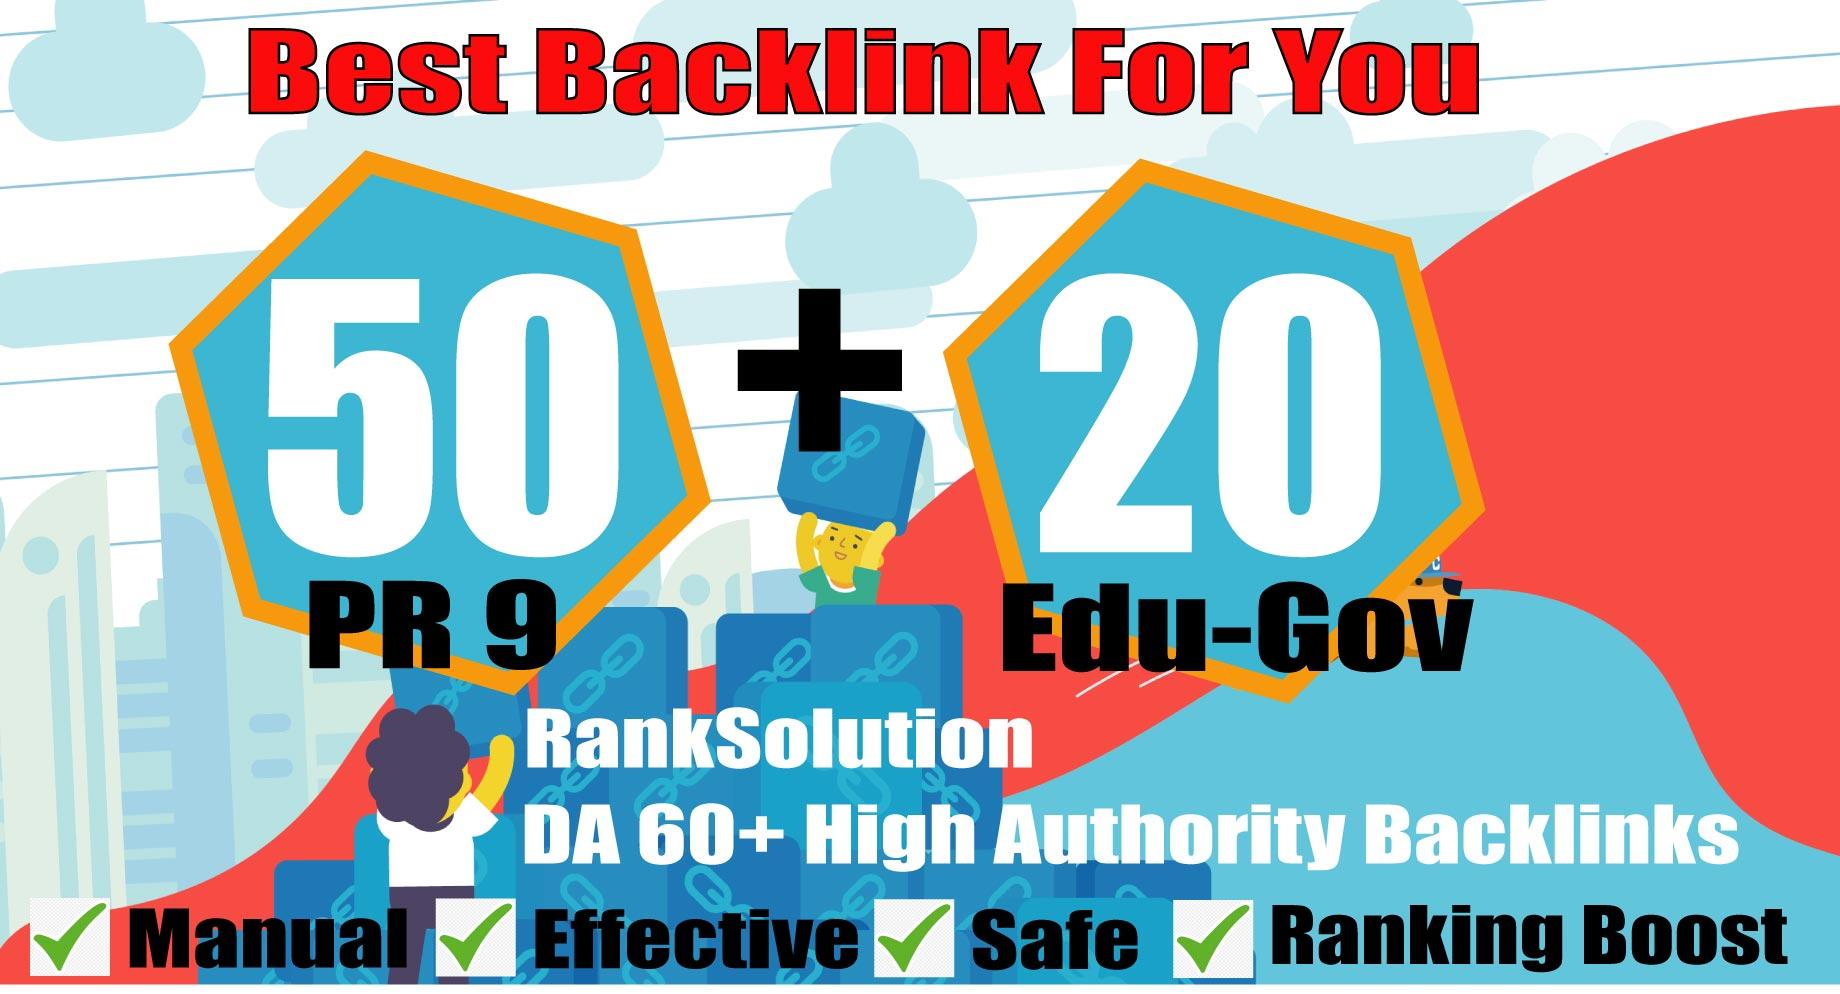 50 PR9+ 20 EDU-GOV Backlinks From Authority Domains